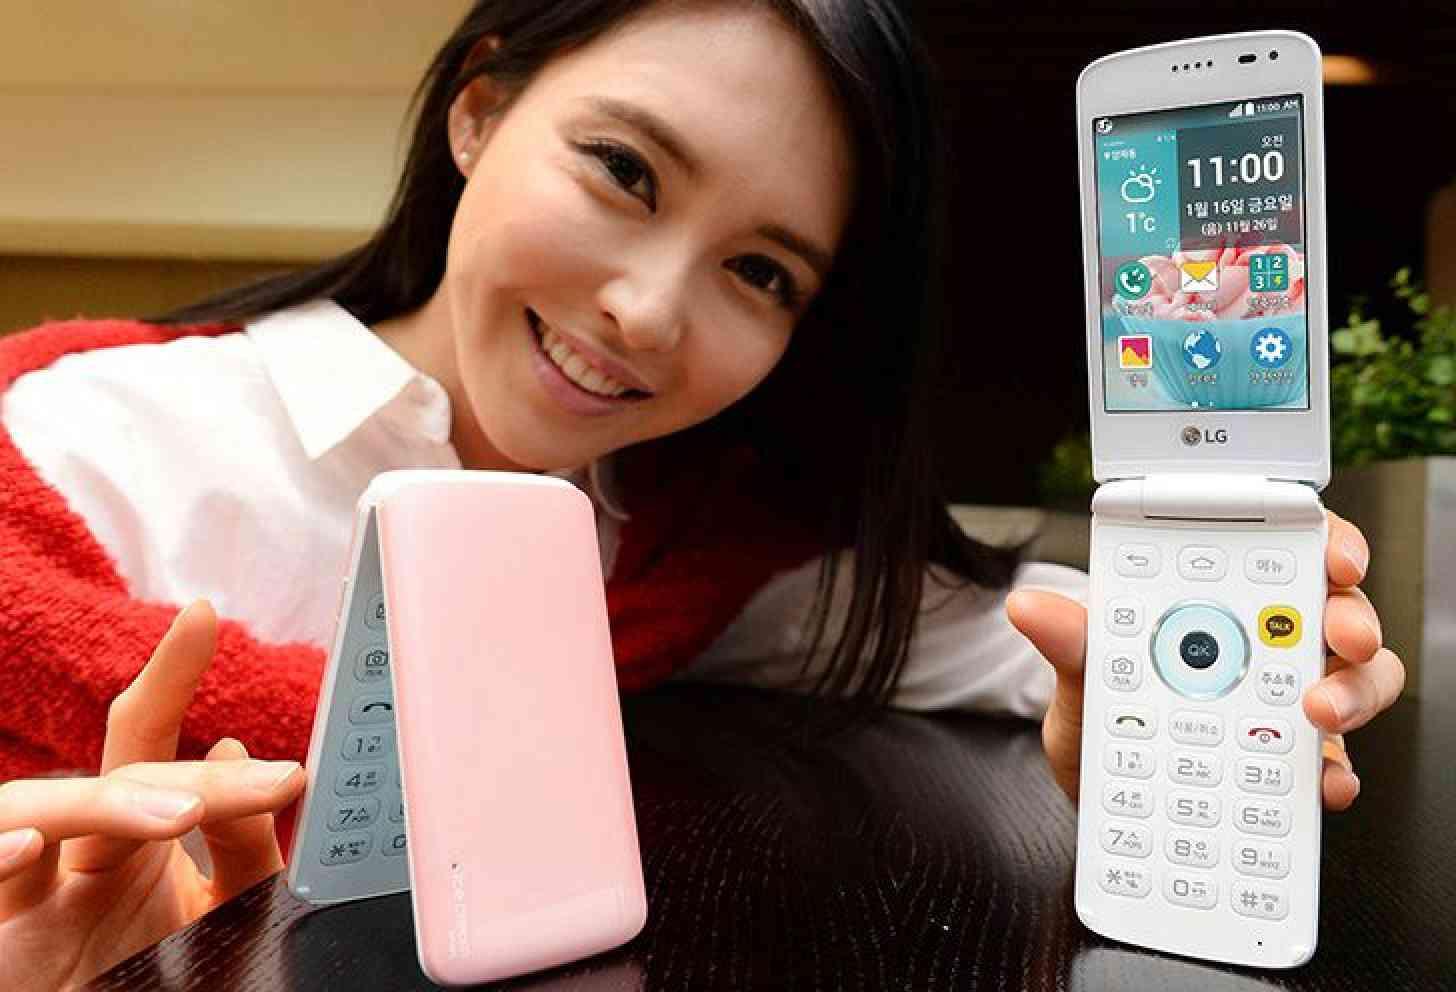 LG Ice Cream Smart Android flip phone